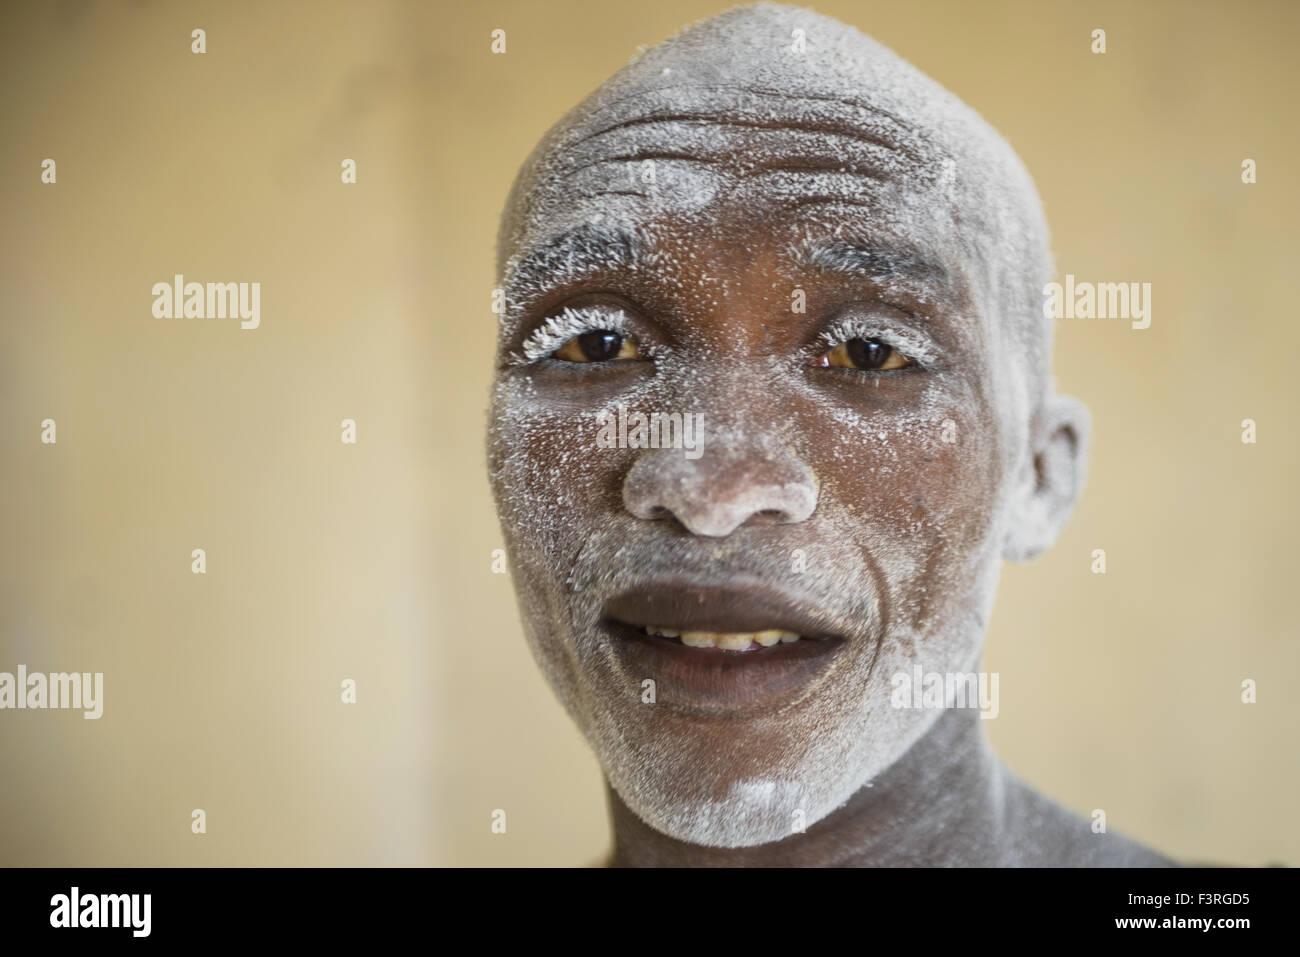 Workers produce cassava, Burundi, Africa - Stock Image